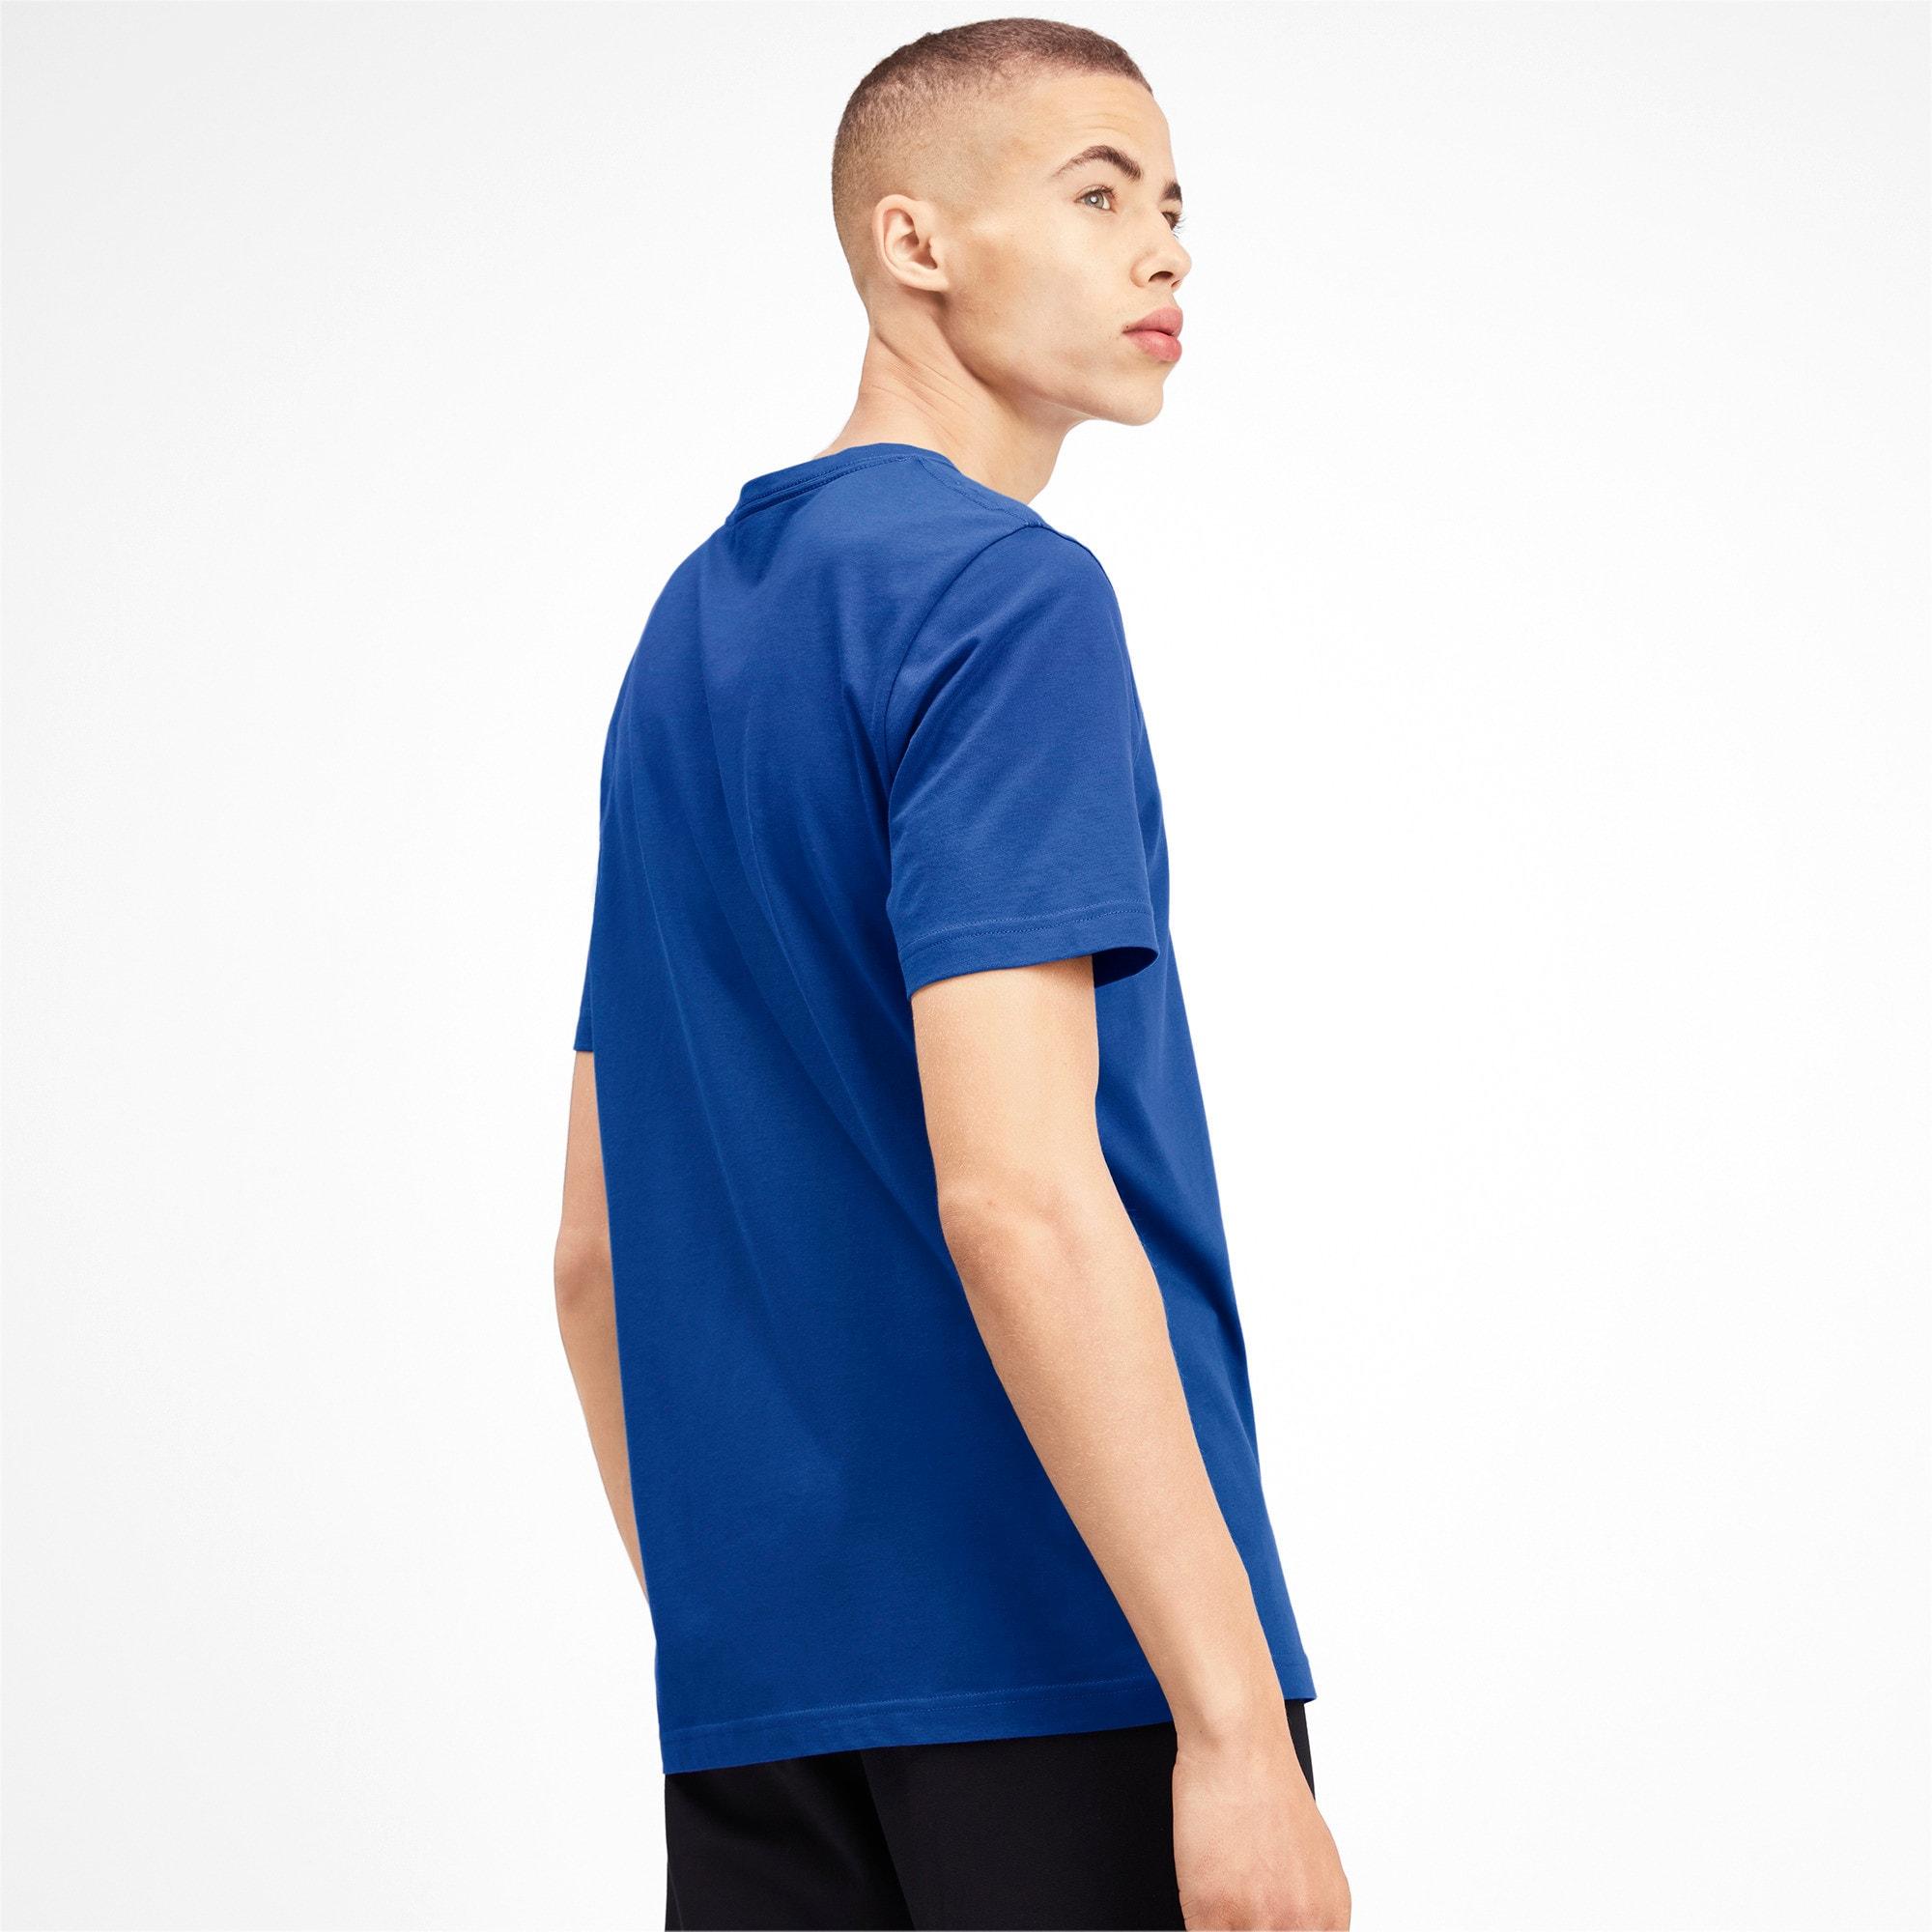 Thumbnail 2 of T-shirt con scollo a V Essentials uomo, Galaxy Blue, medium